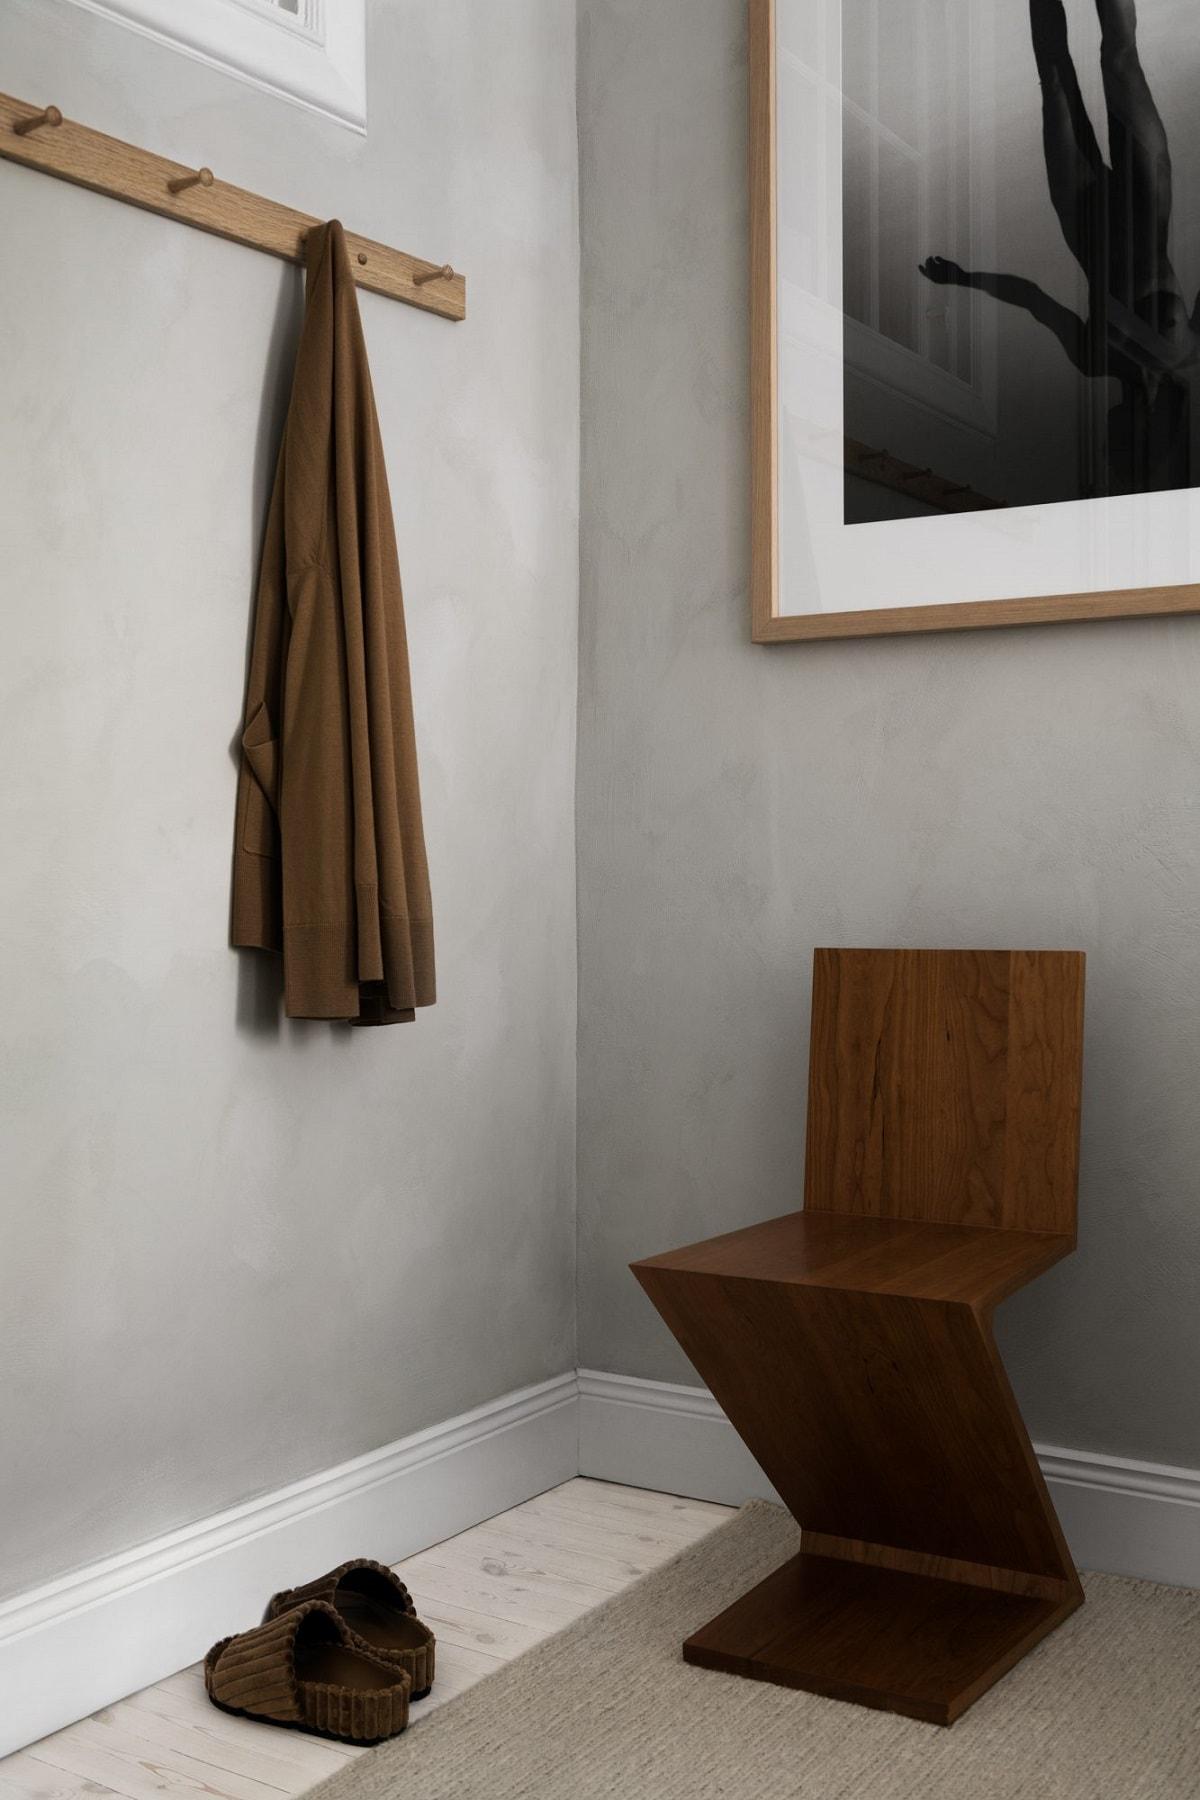 280 Zig Zag椅子,作者Gerrit Thomas Rietveld为Cassina设计